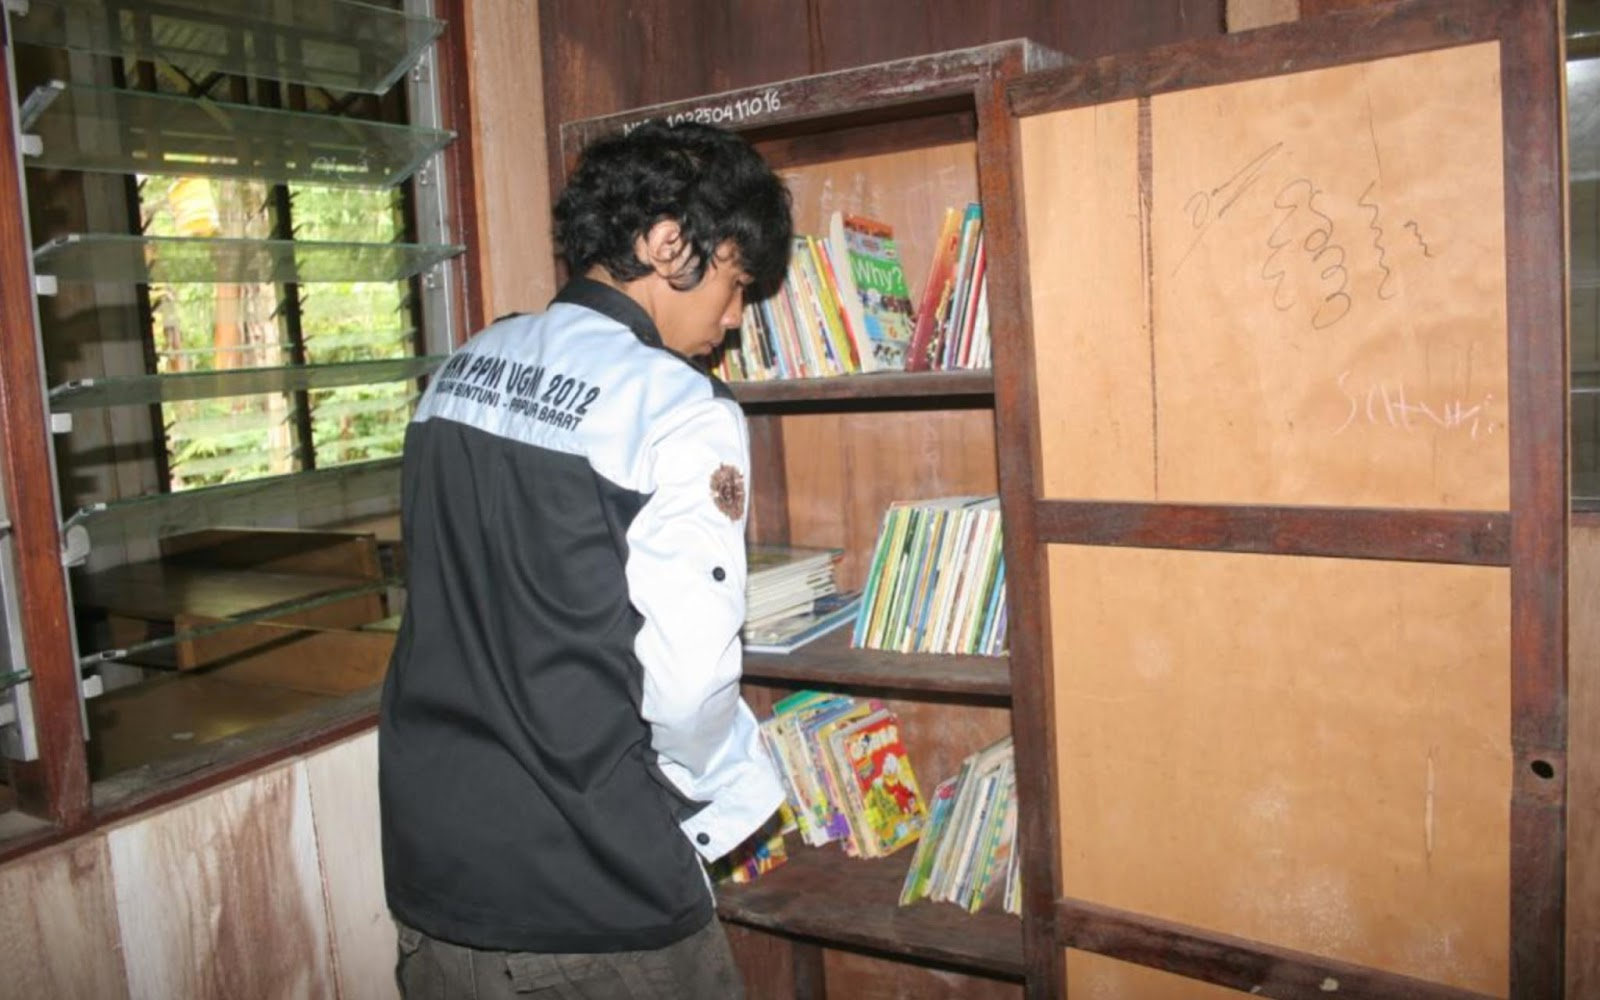 lemari perpustakaan di SD Yakati Teluk Bintuni Papua Barat project Book for Mountain